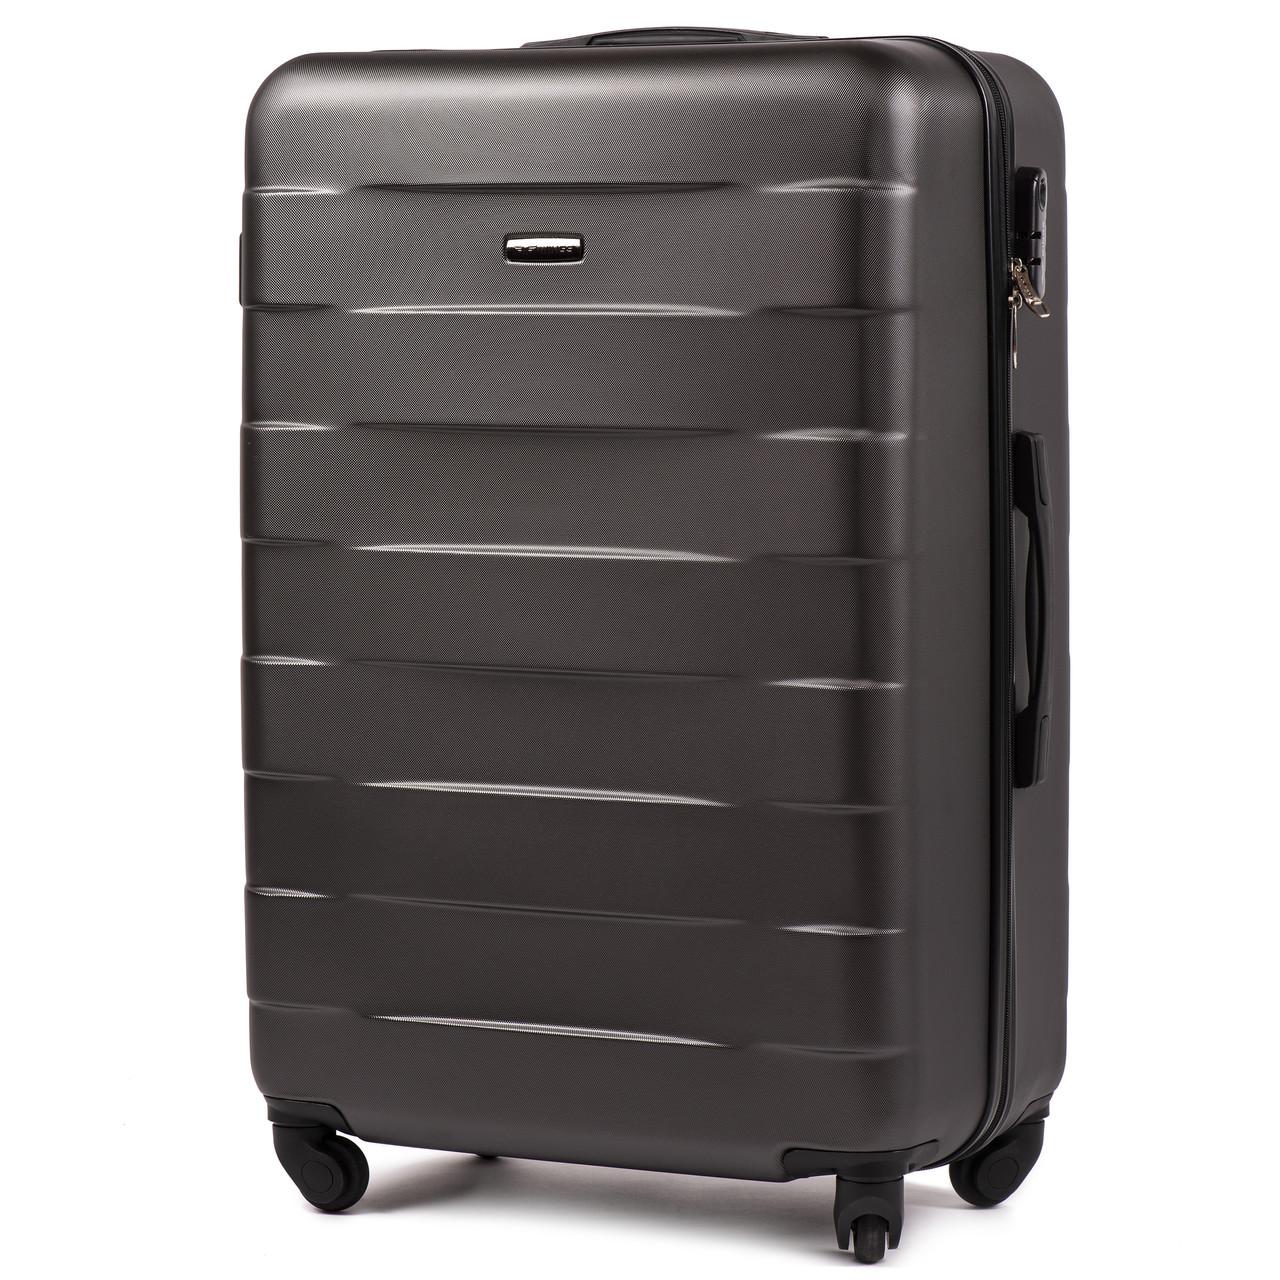 Средний пластиковый чемодан Wings 401 на 4 колесах серый, фото 1